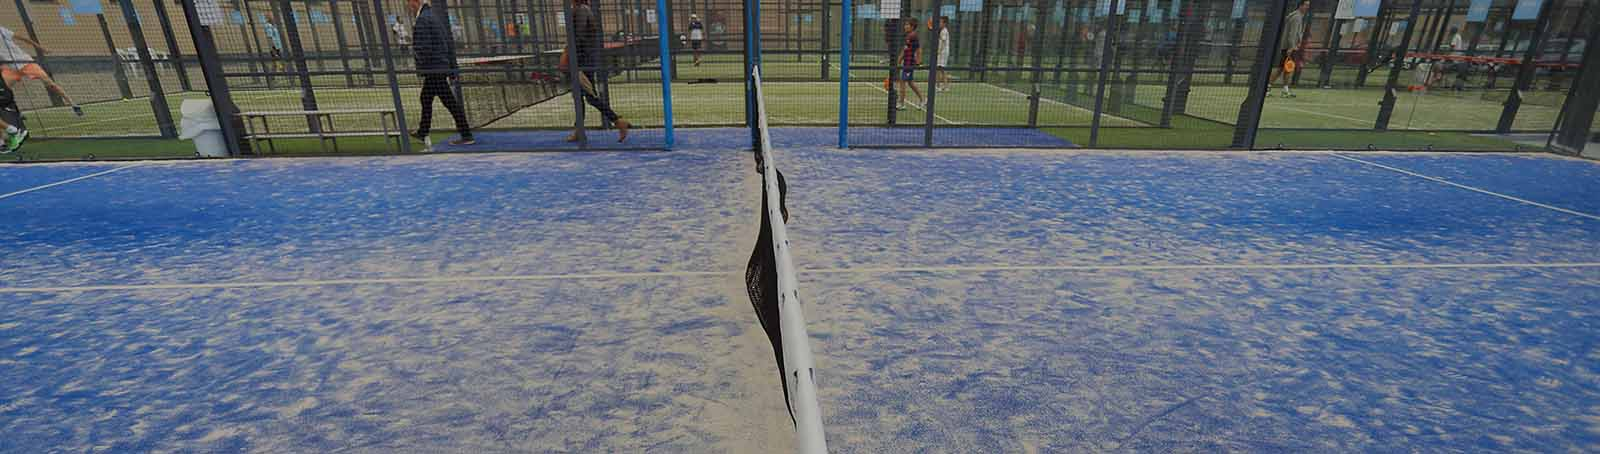 Artós Sports Club